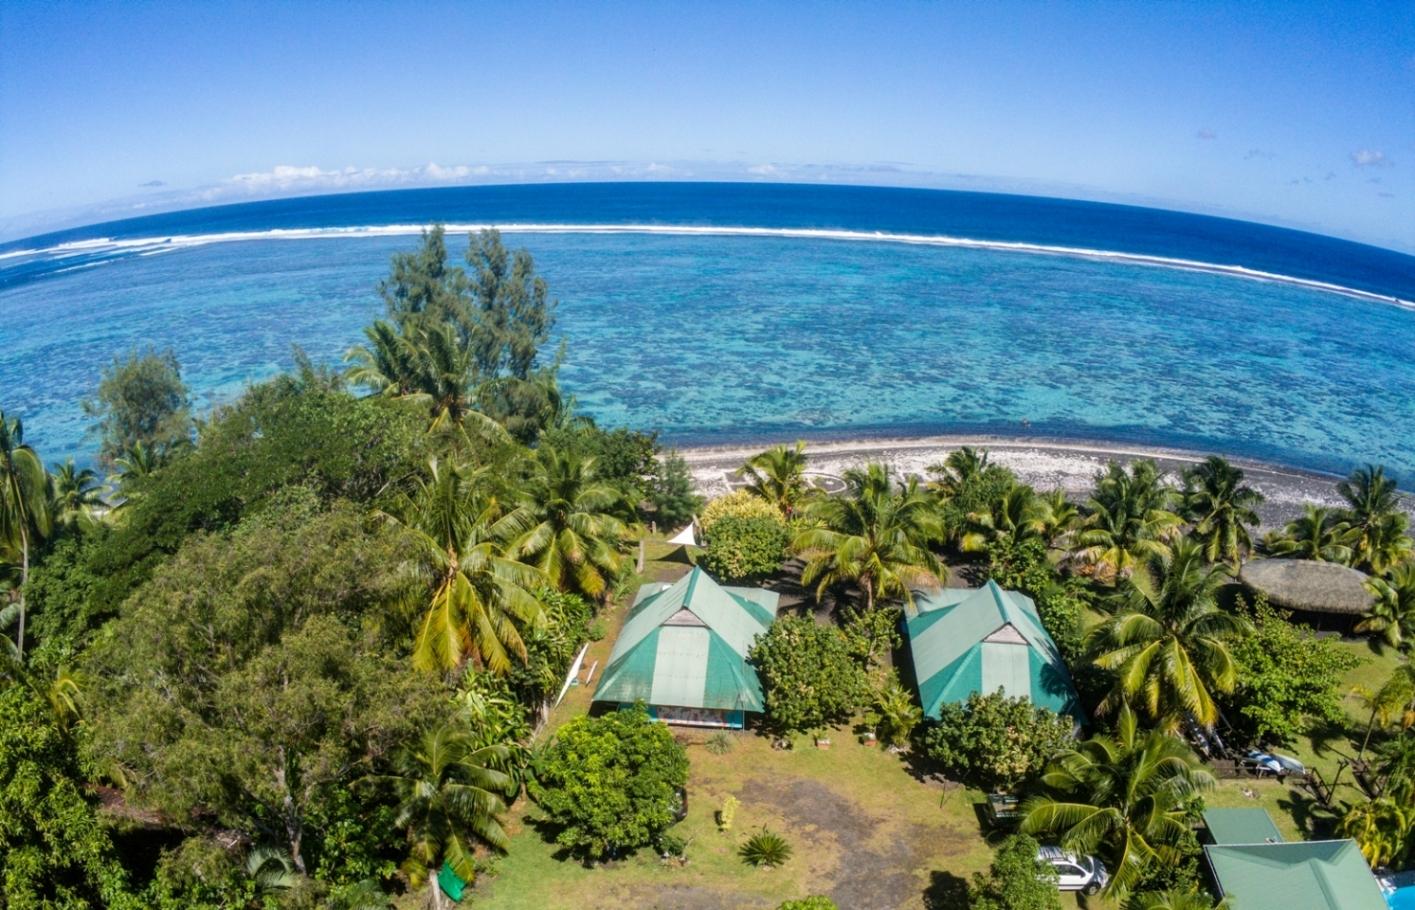 https://tahititourisme.com.au/wp-content/uploads/2019/08/copie-Tahiti-tourisme-948ko.jpg